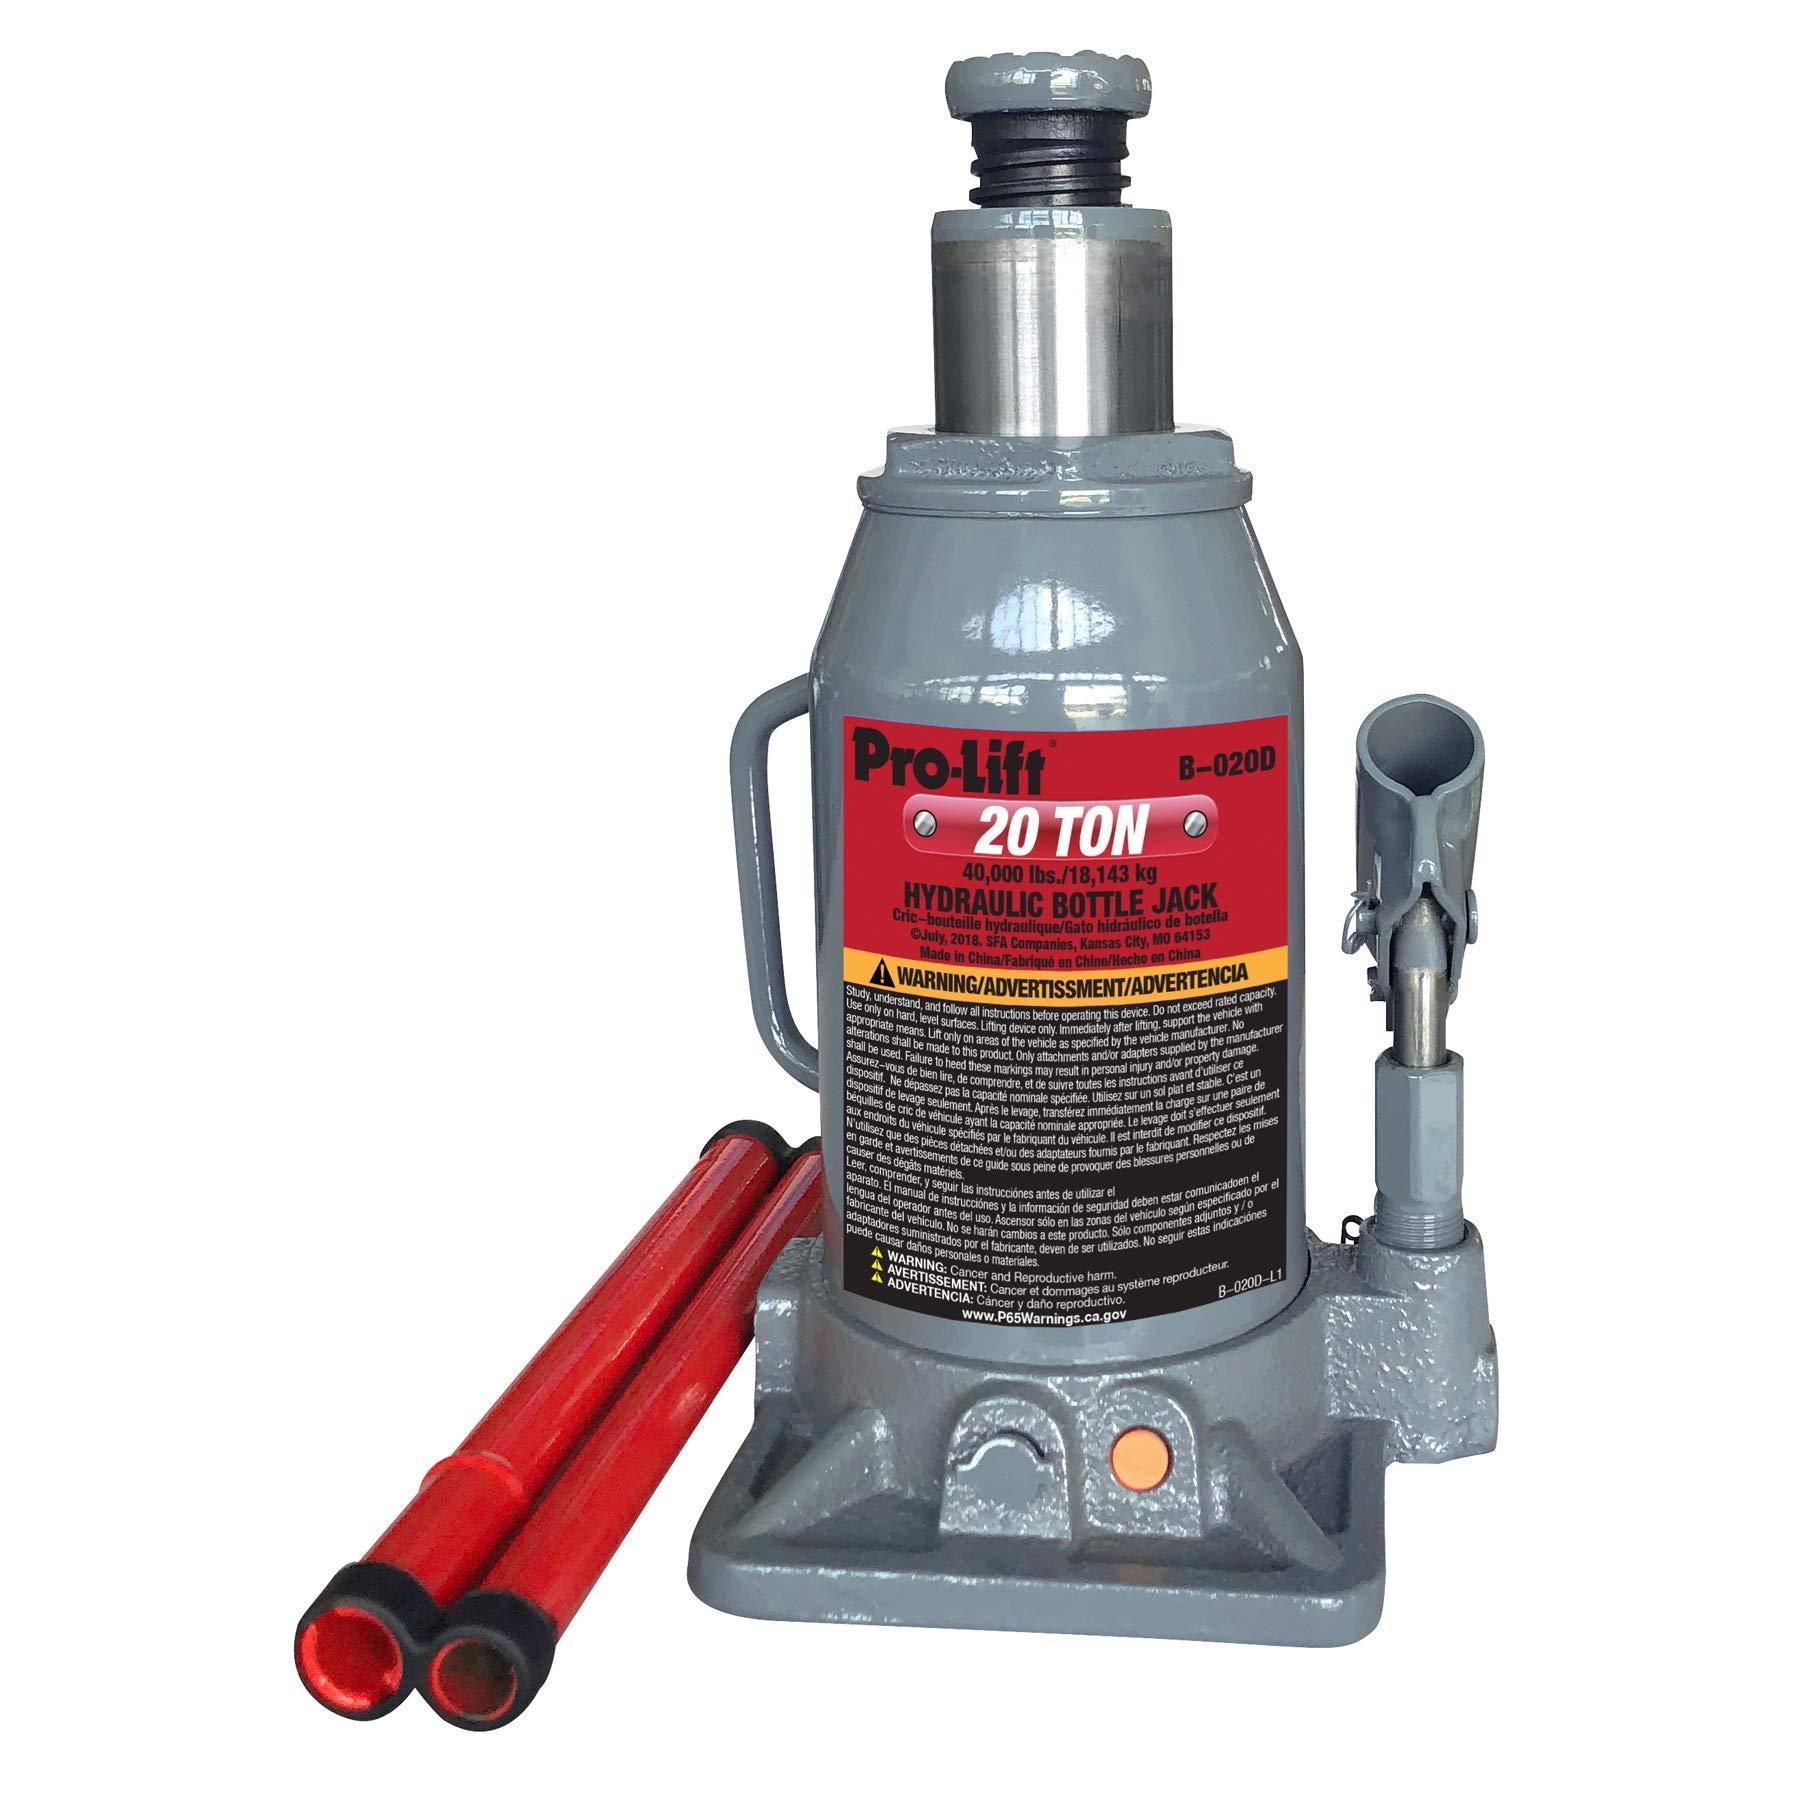 Pro-Lift B-020D Grey Hydraulic Bottle Jack - 20 Ton Capacity by Pro-LifT